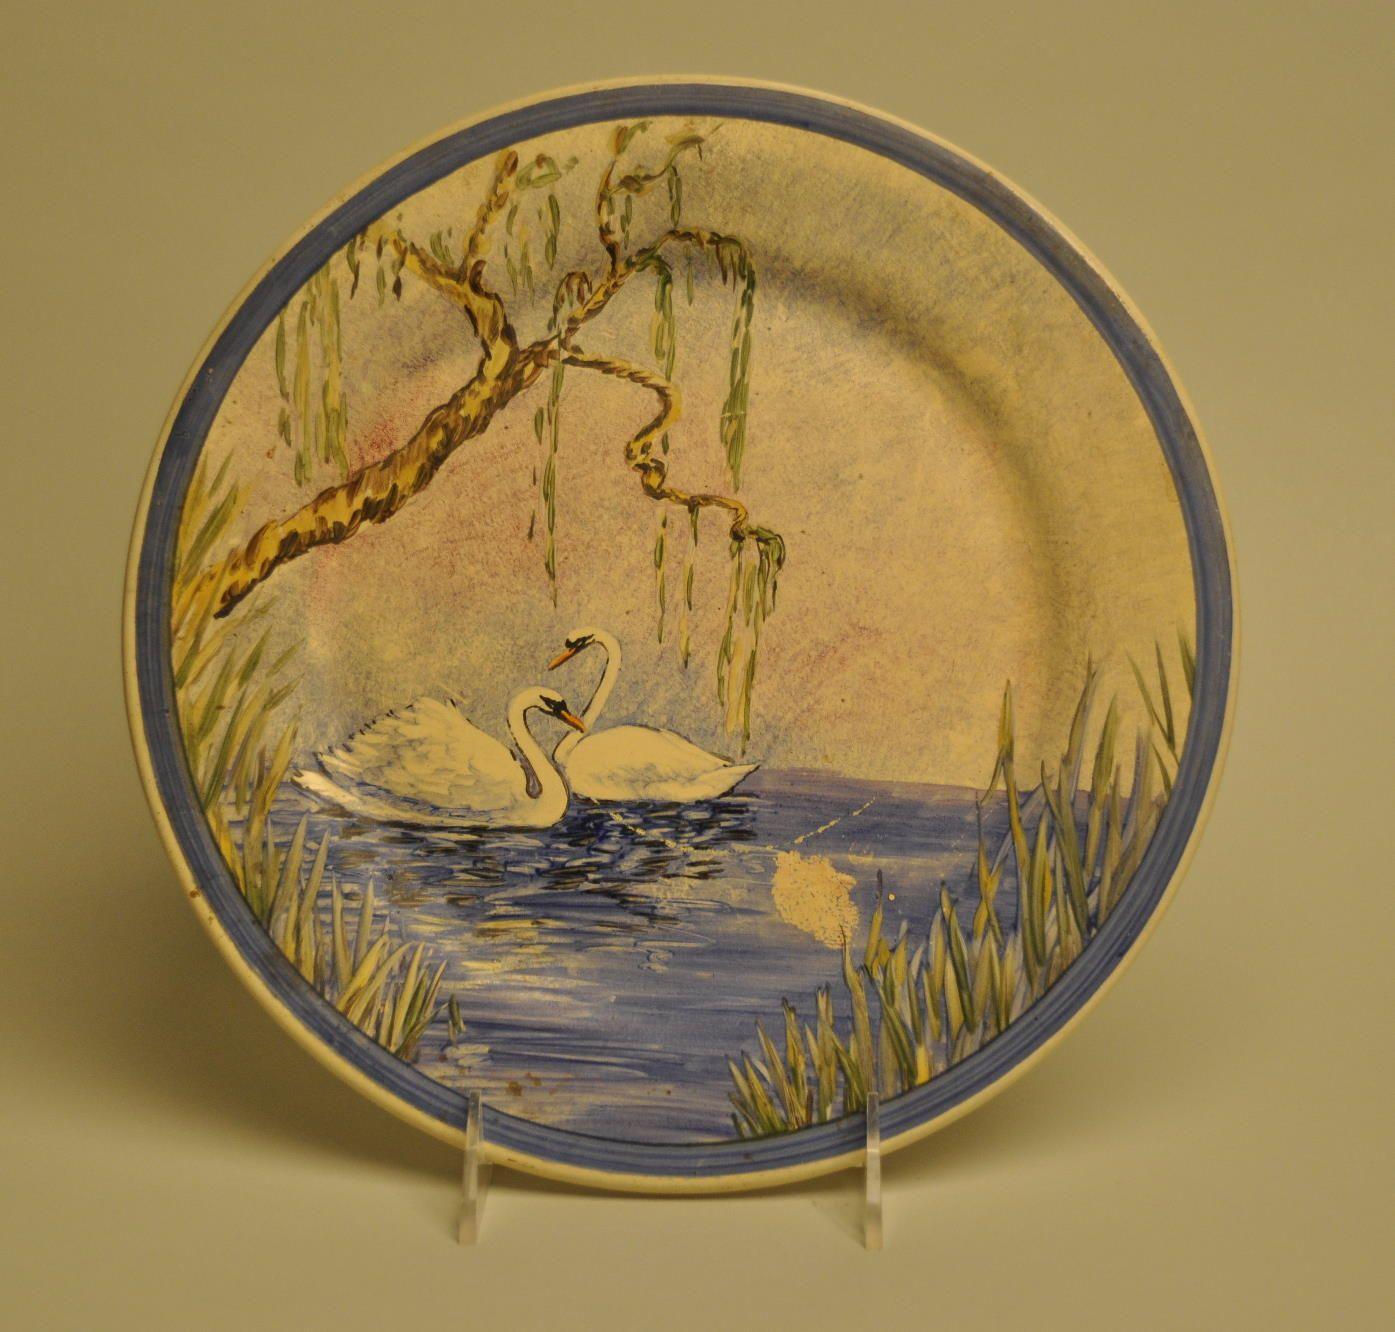 File: Catalina pottery plate.jpg - Wikipedia, the free encyclopedia